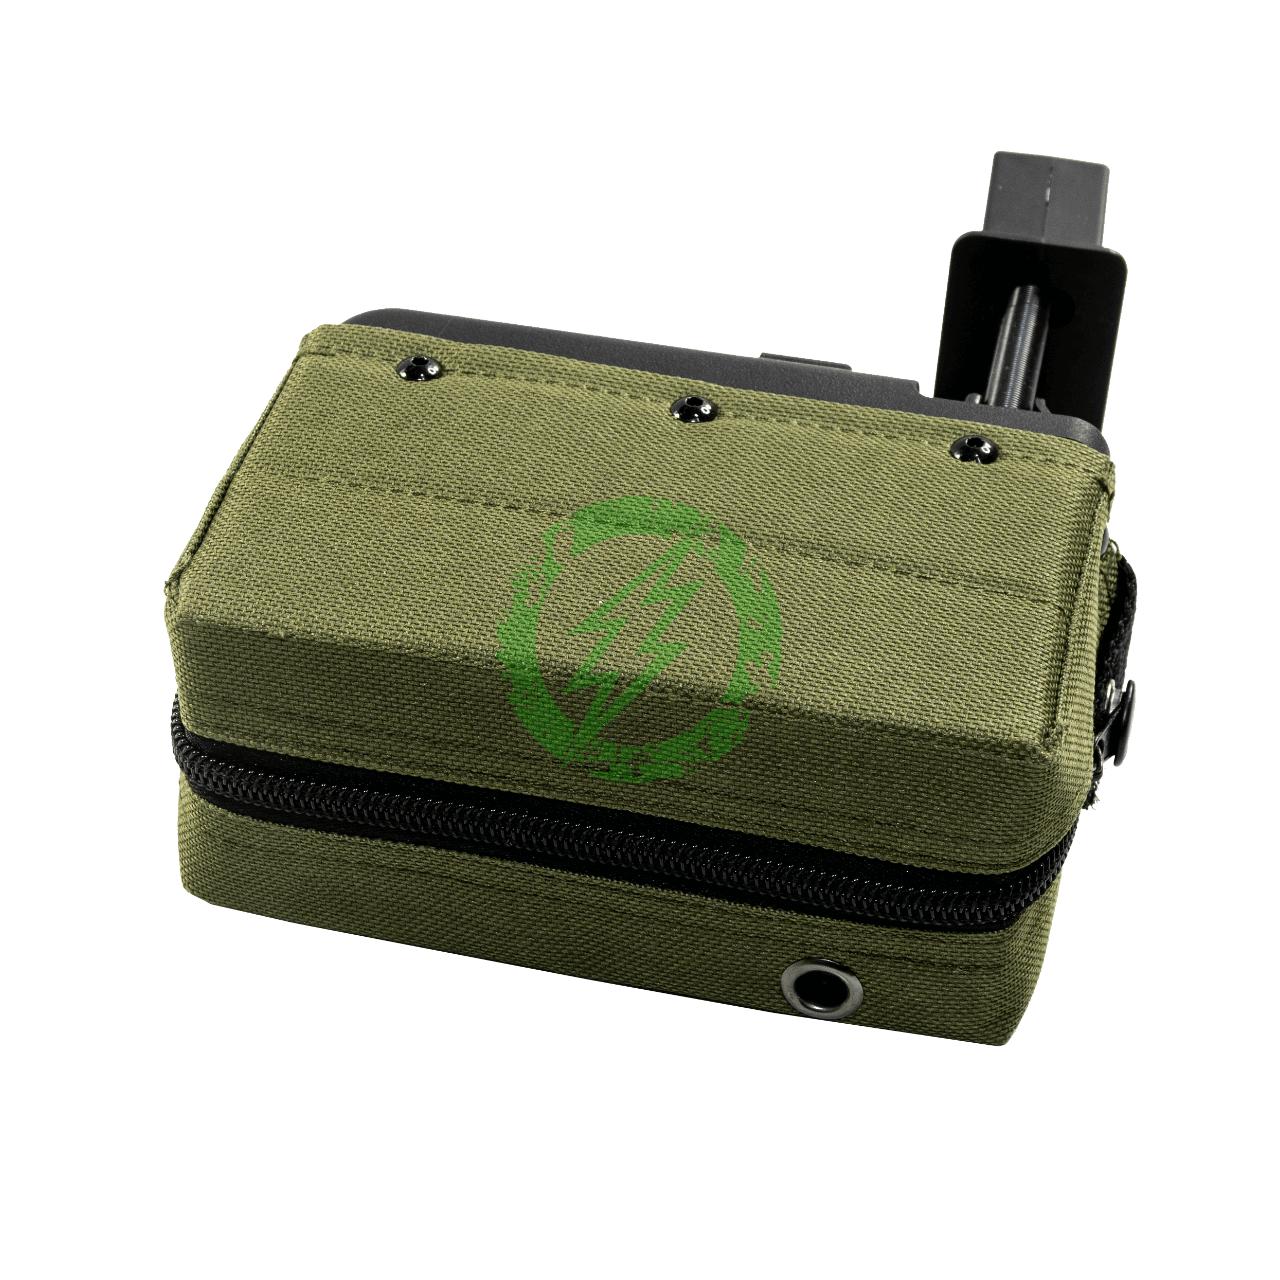 A&K 1500 Round Box Magazine for Airsoft M249 Series AEG | OD zipper